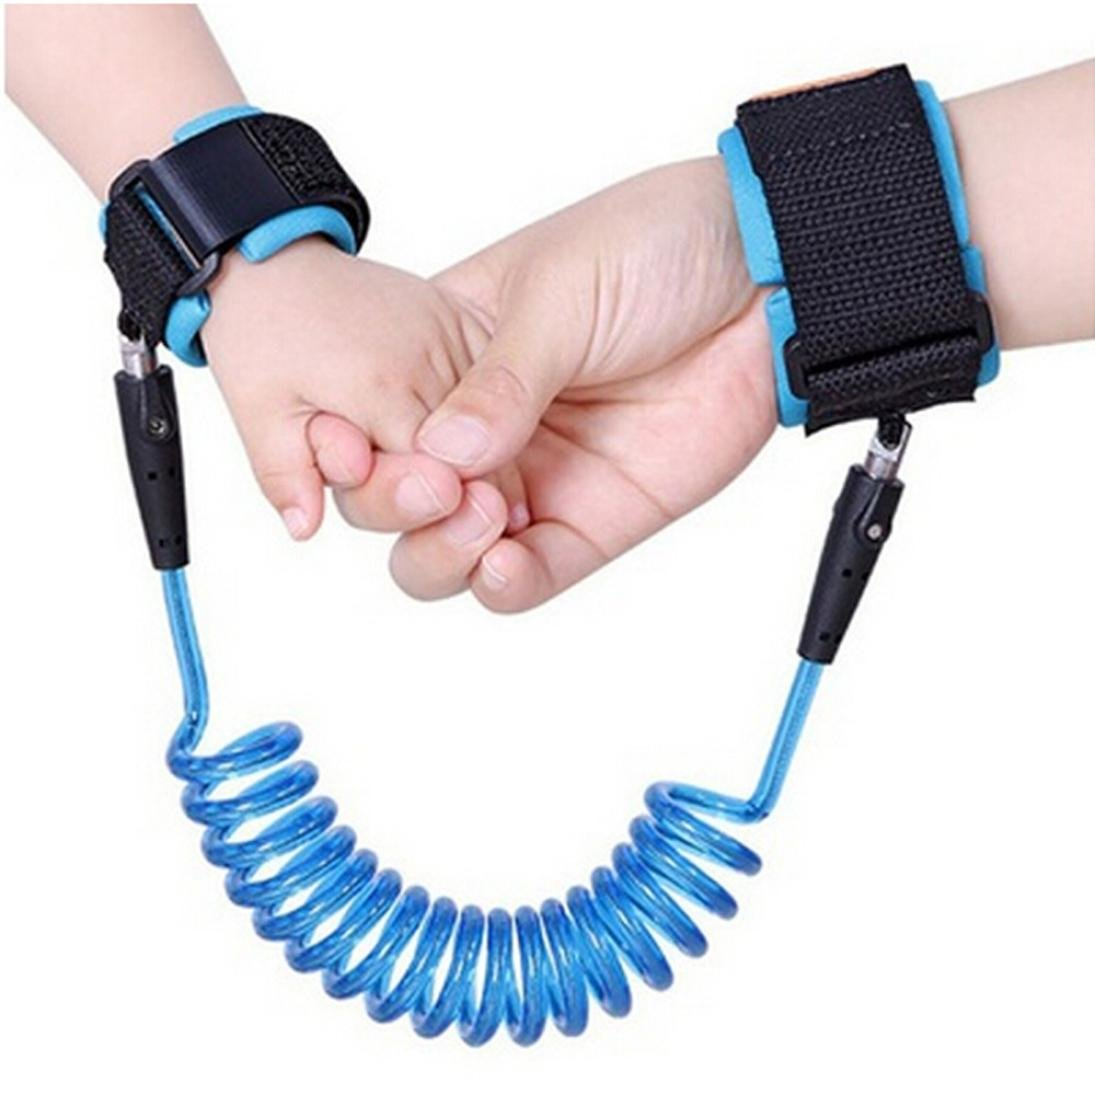 Anti-lost Wrist Link, MML Child Anti Lost Wrist Link Safety Leash Baby Toddler Wrist Straps Kids Hand Belt Flexible Children Walking Strap 1.5 Meters Stretched (Blue) MML-007